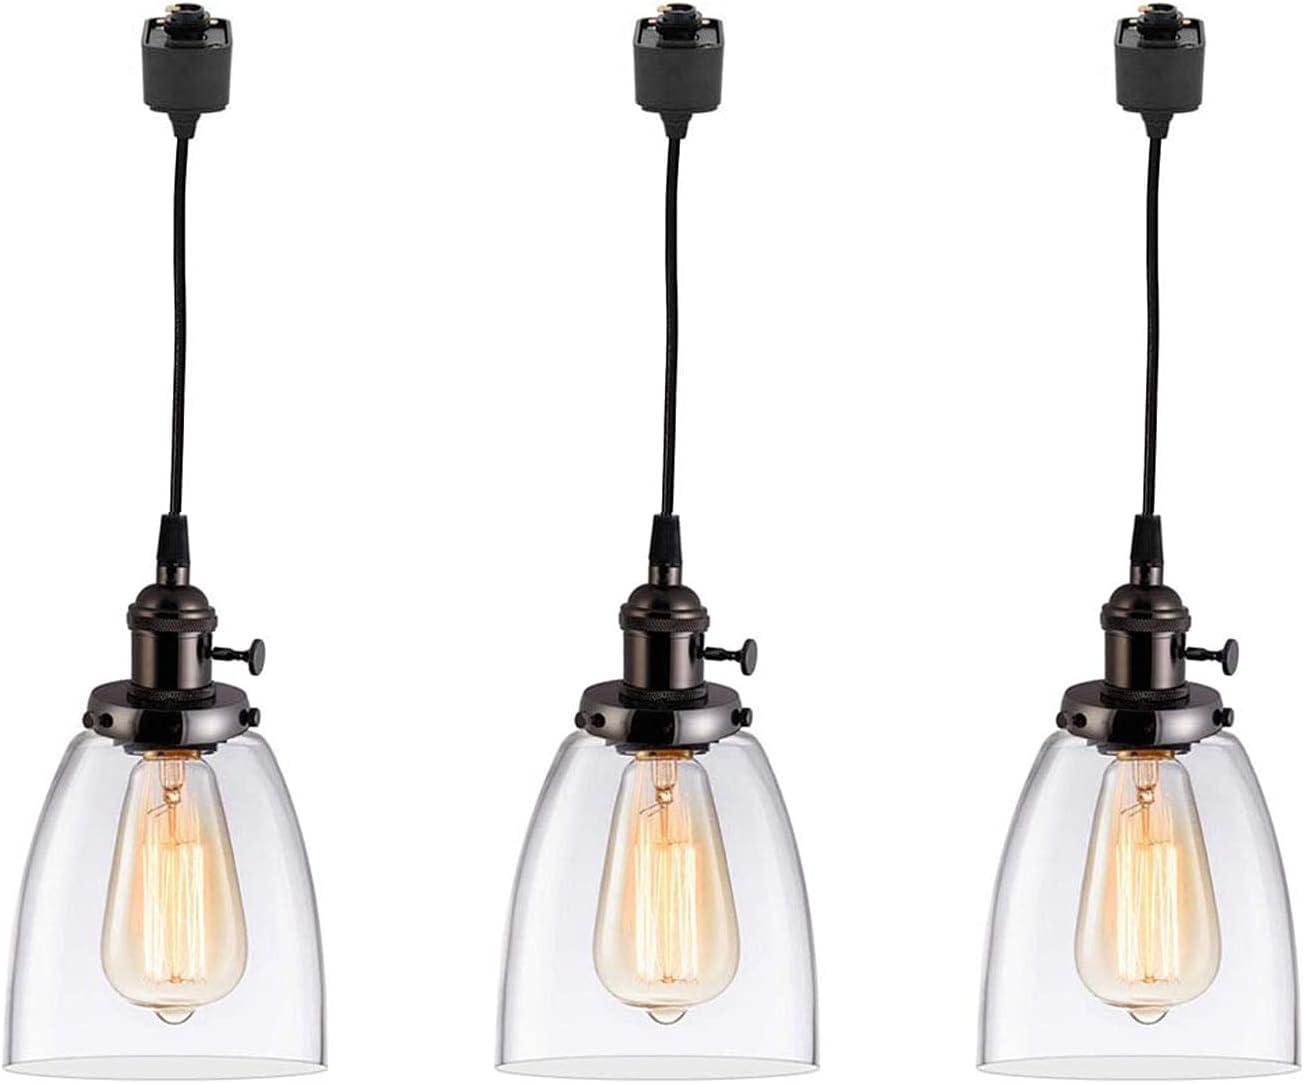 Nippon regular agency KIVEN 3-Lights H-Type Track Max 72% OFF Pendant Lighting Dimmable Pendants